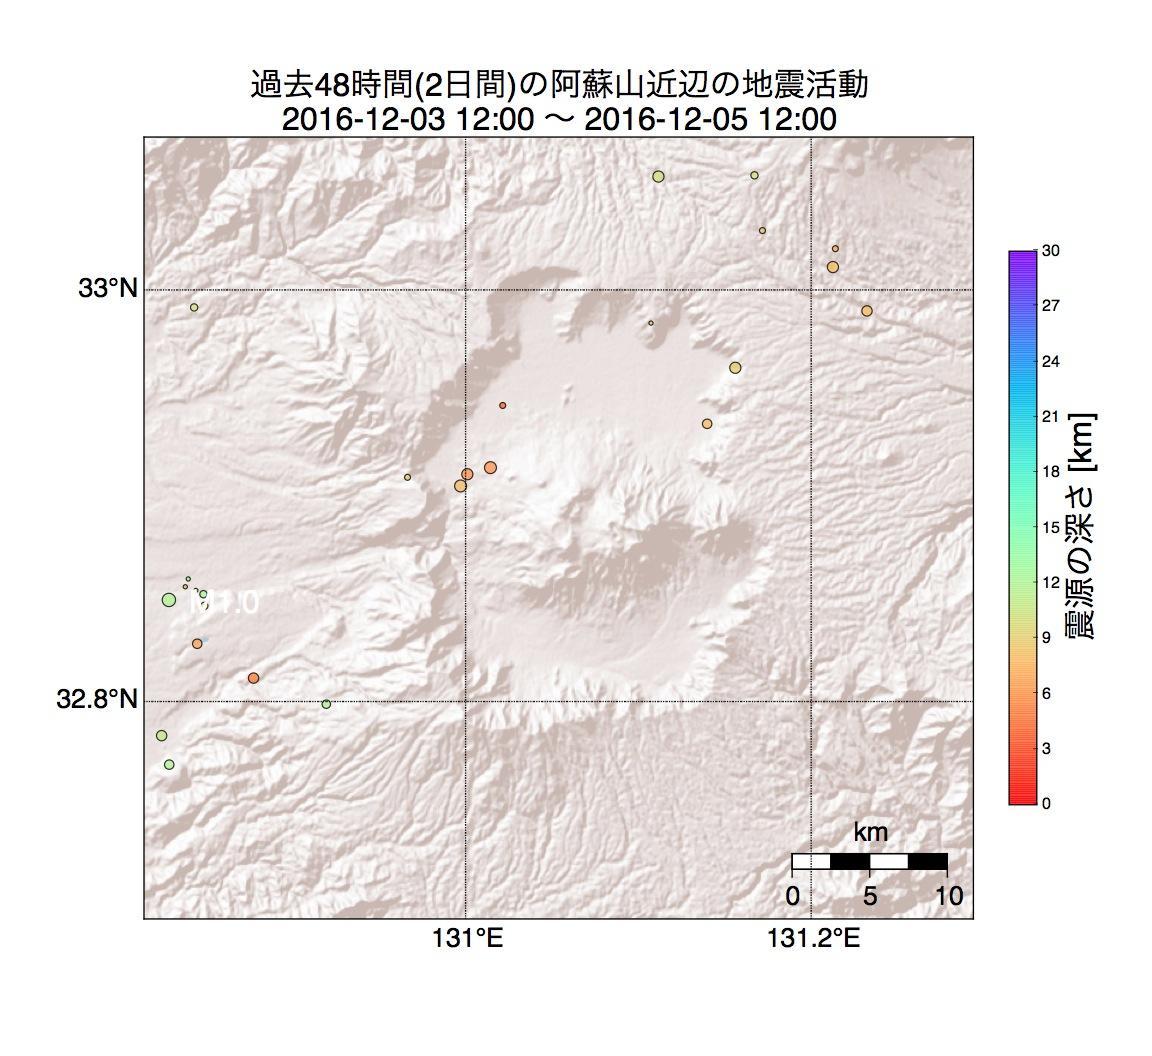 http://jishin.chamu.org/aso/20161205_1.jpg